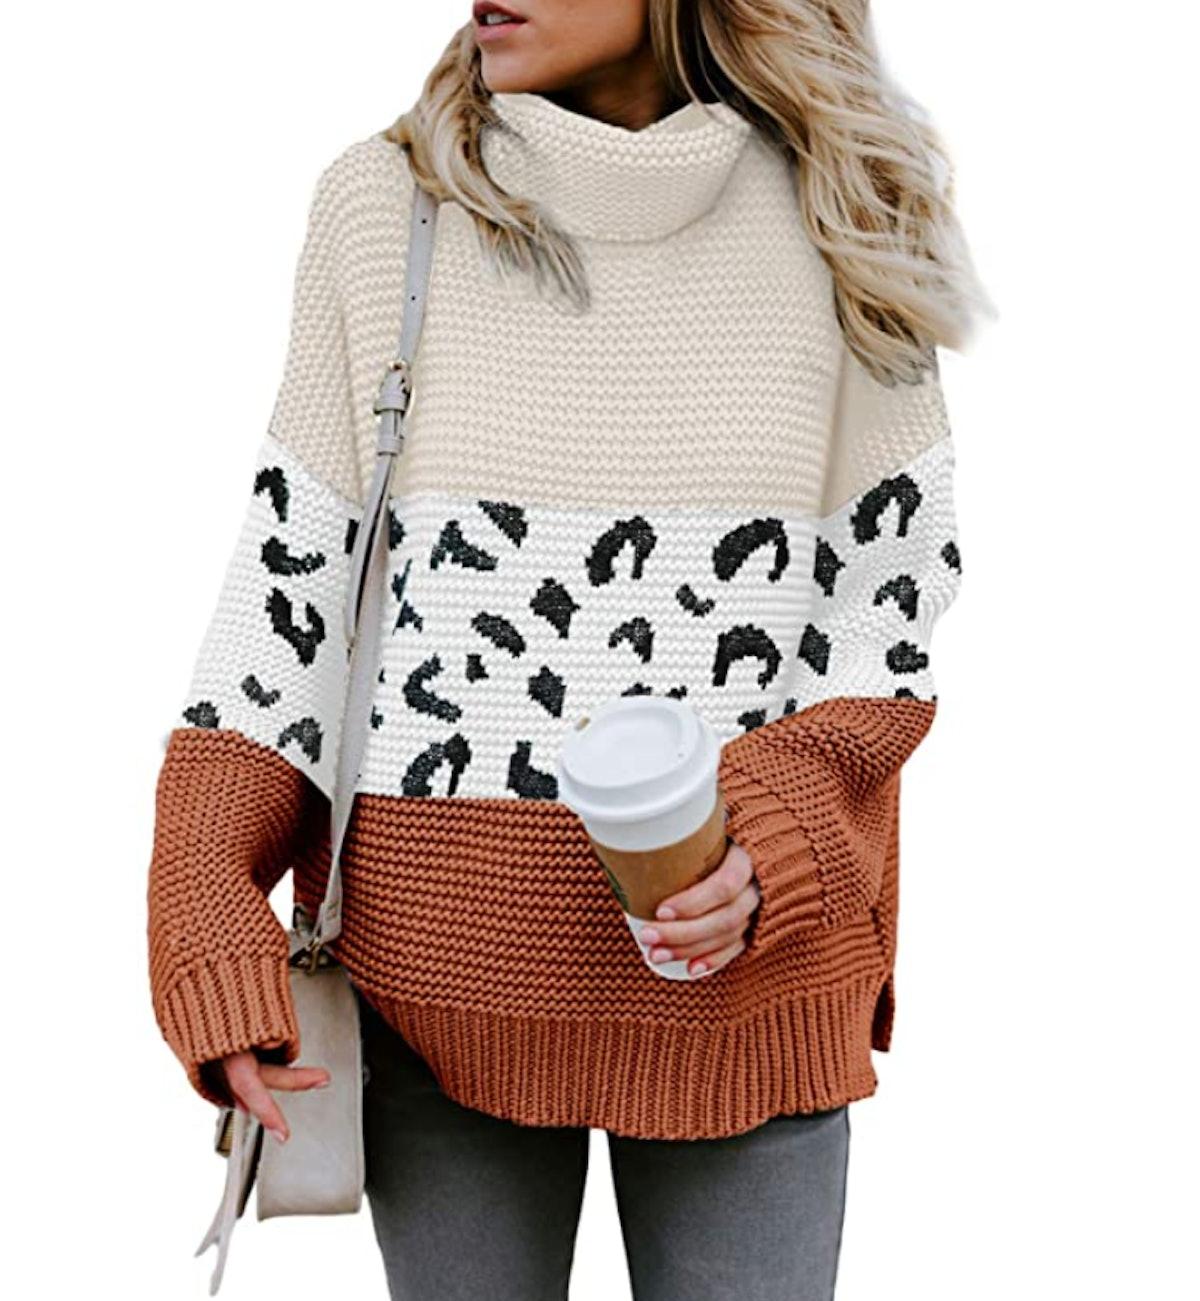 Chase Secret Cowl-Neck Sweater